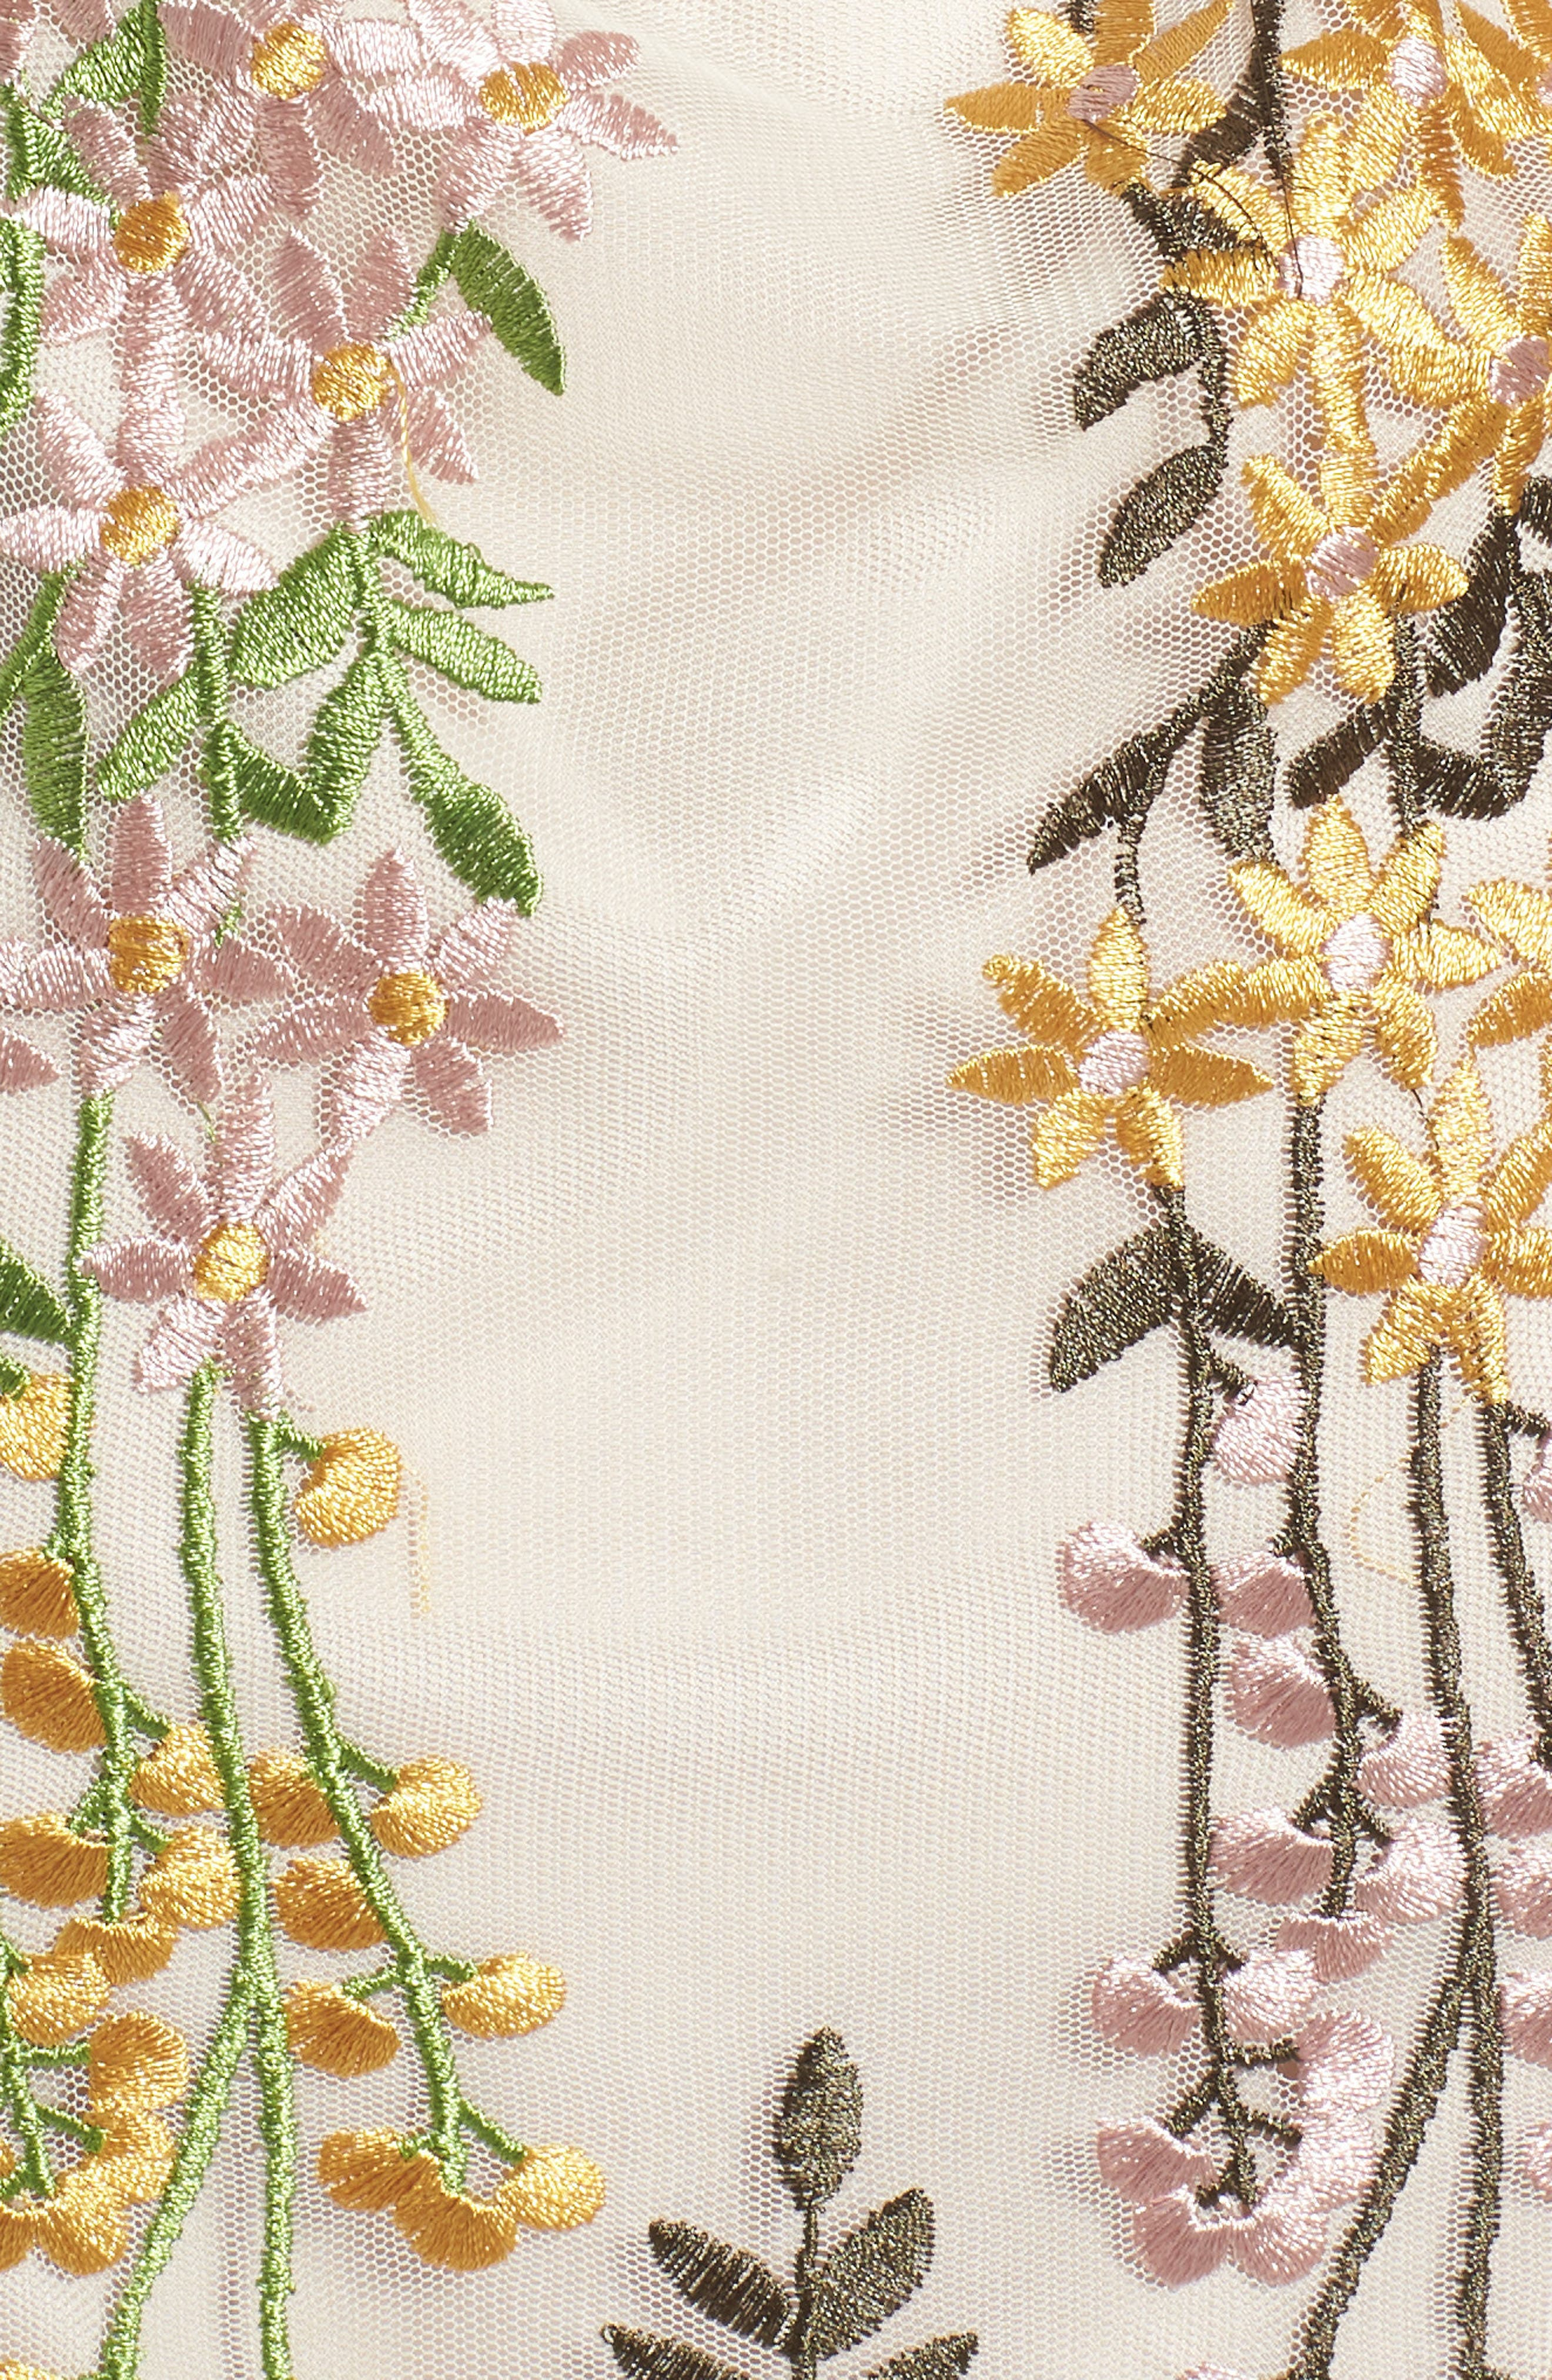 Gram Embroidered Minidress,                             Alternate thumbnail 6, color,                             Soft Beige